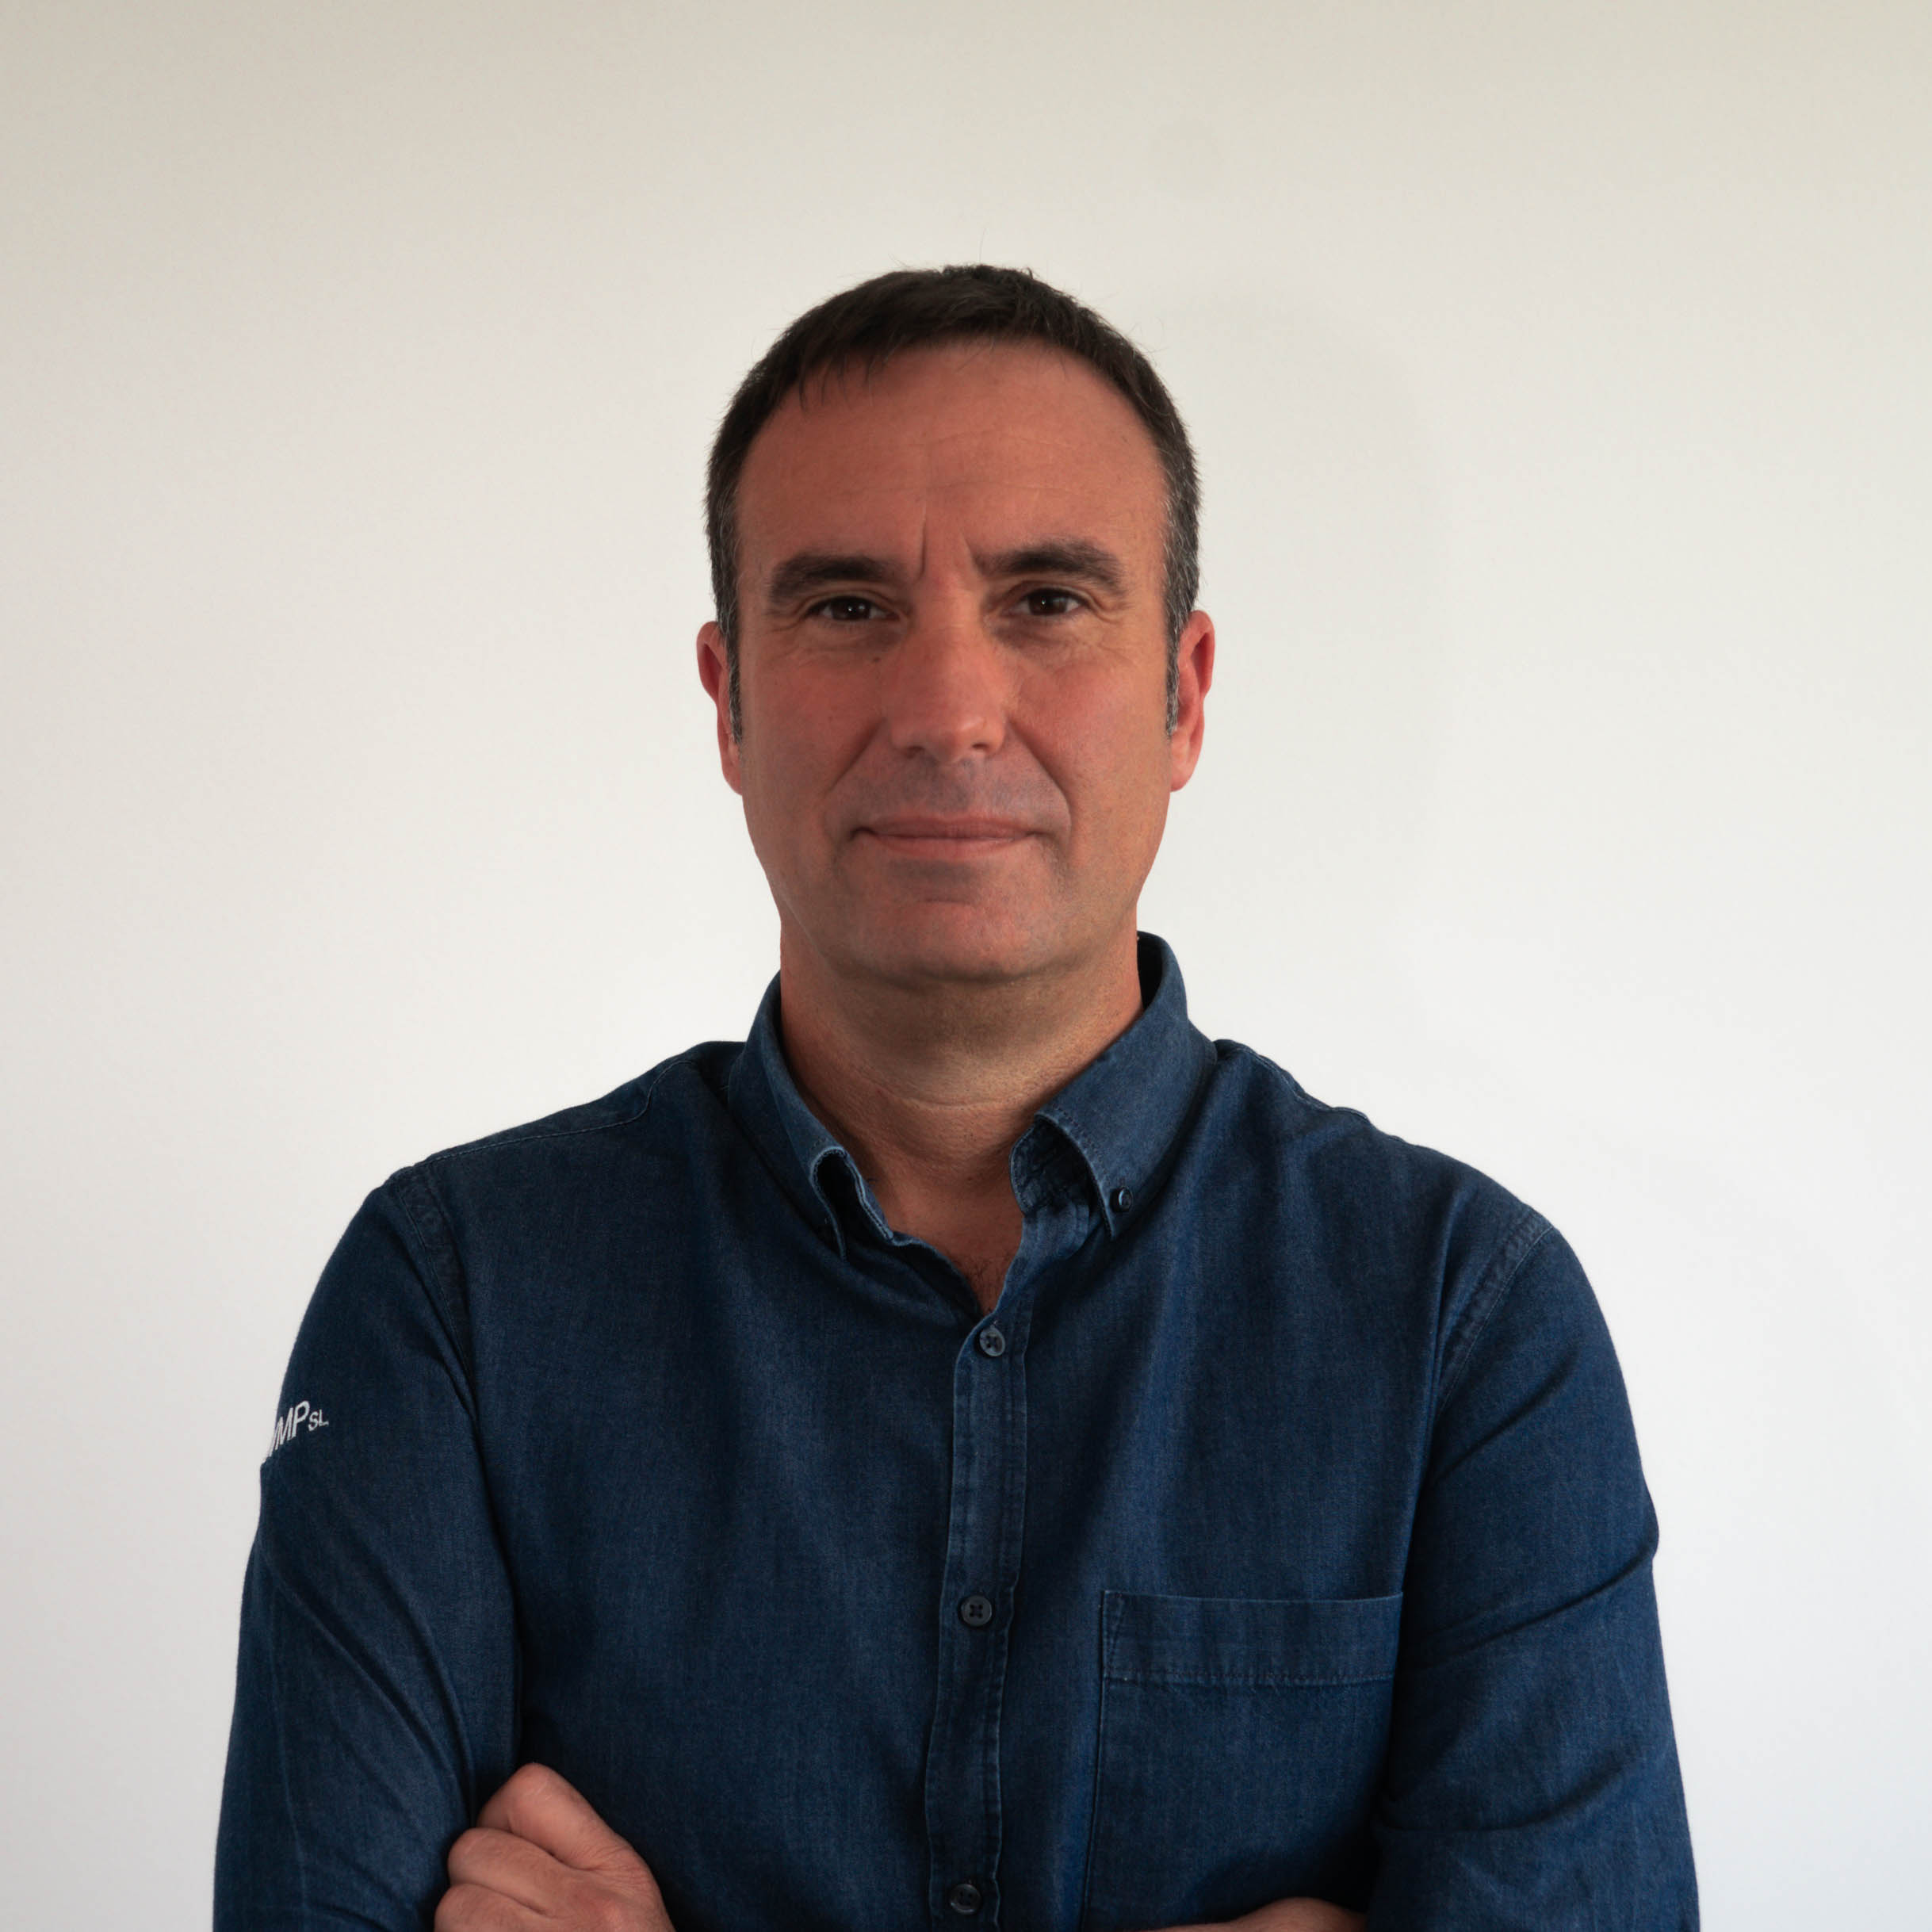 Jaume Pujol Boj